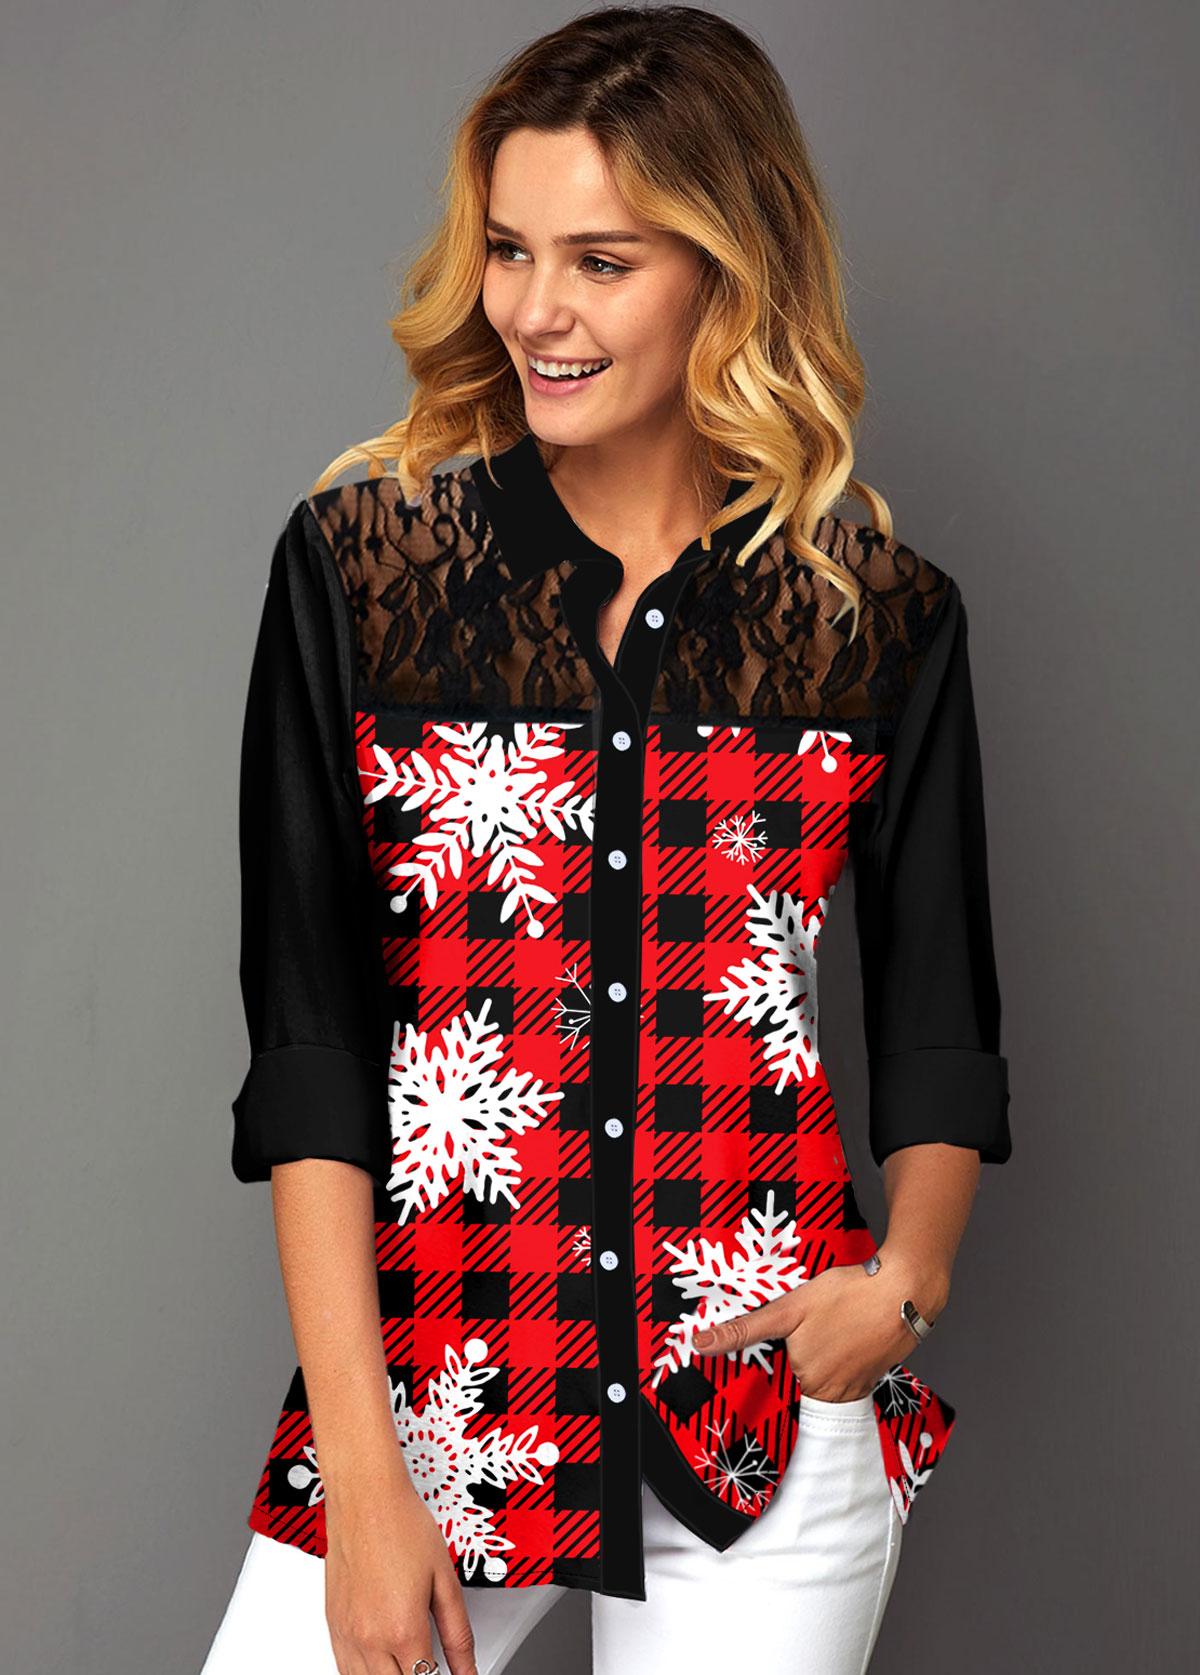 ROTITA Lace Panel Plaid and Snowflake Print Shirt